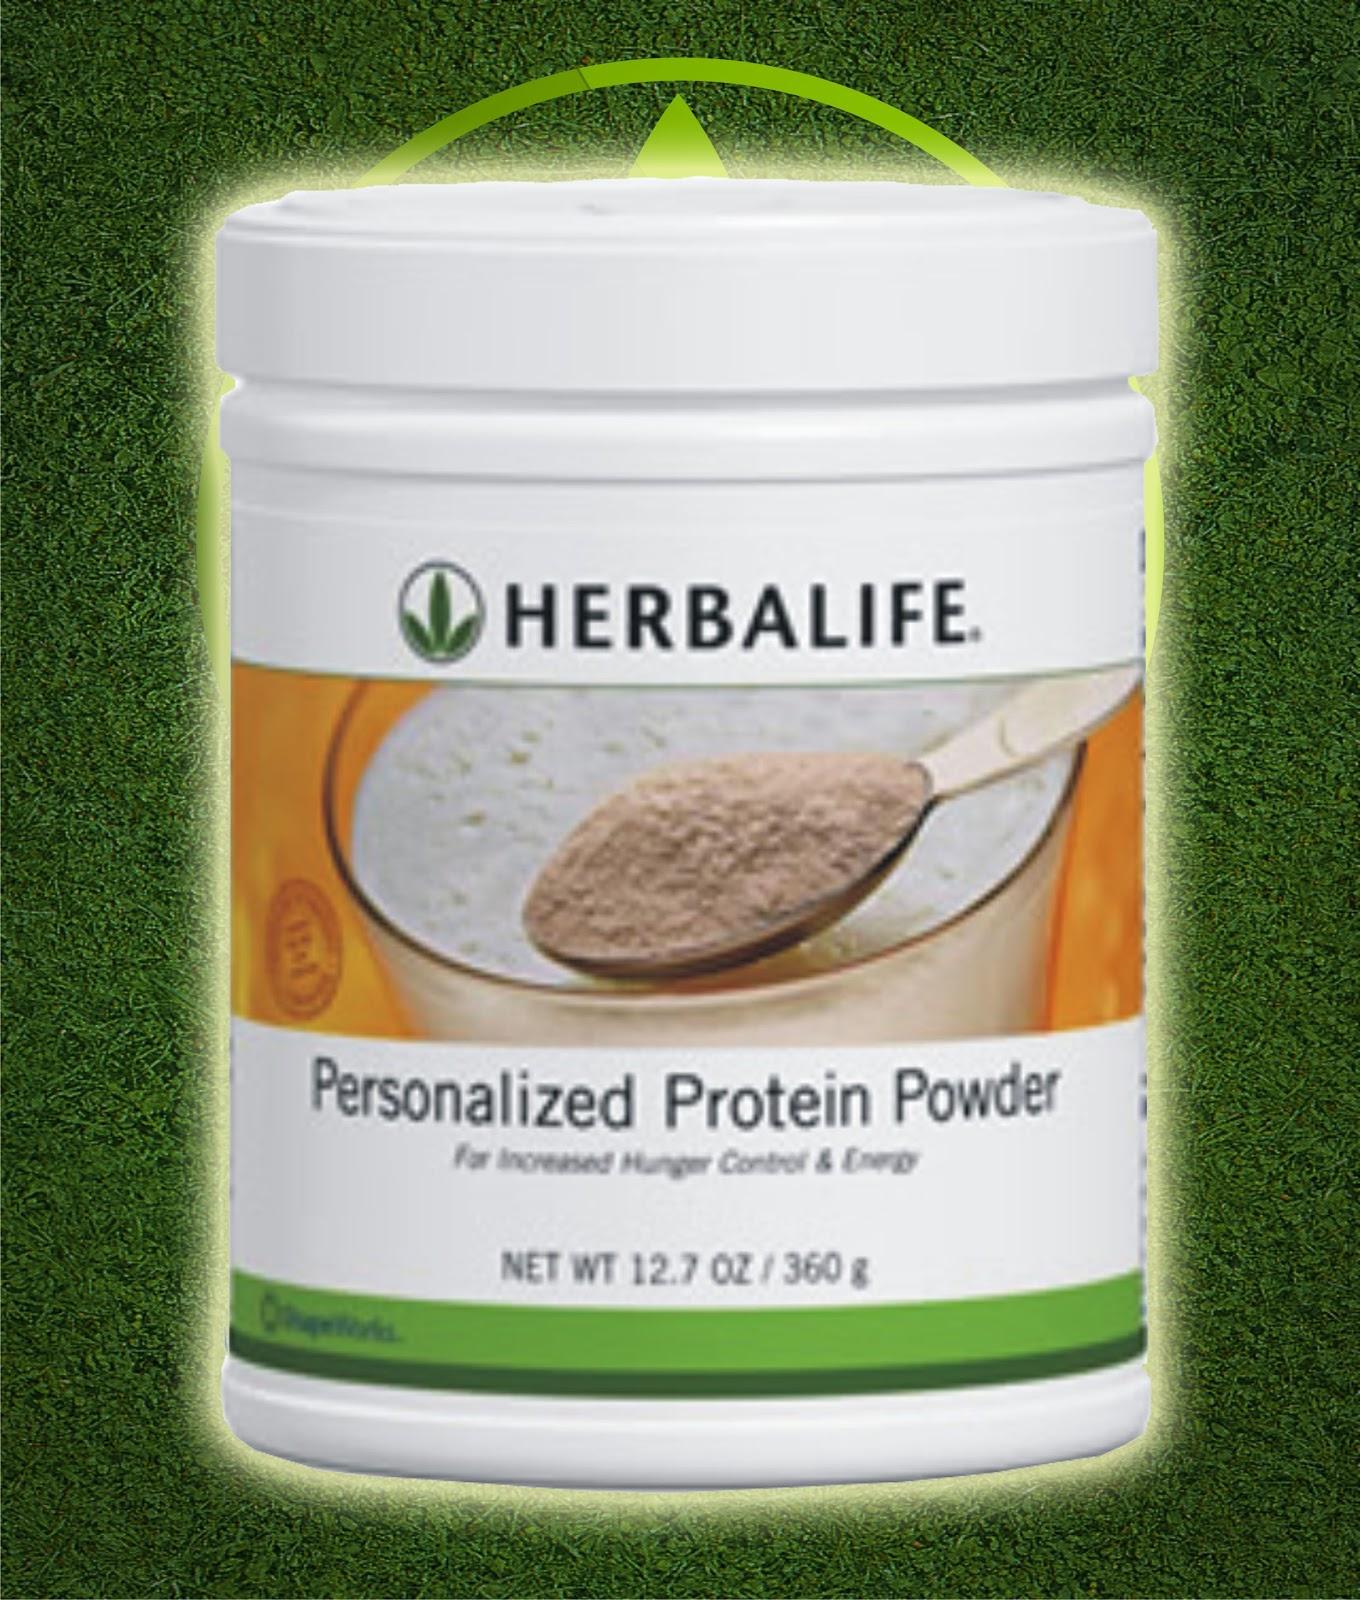 Herbalife Protein Powders Philippines